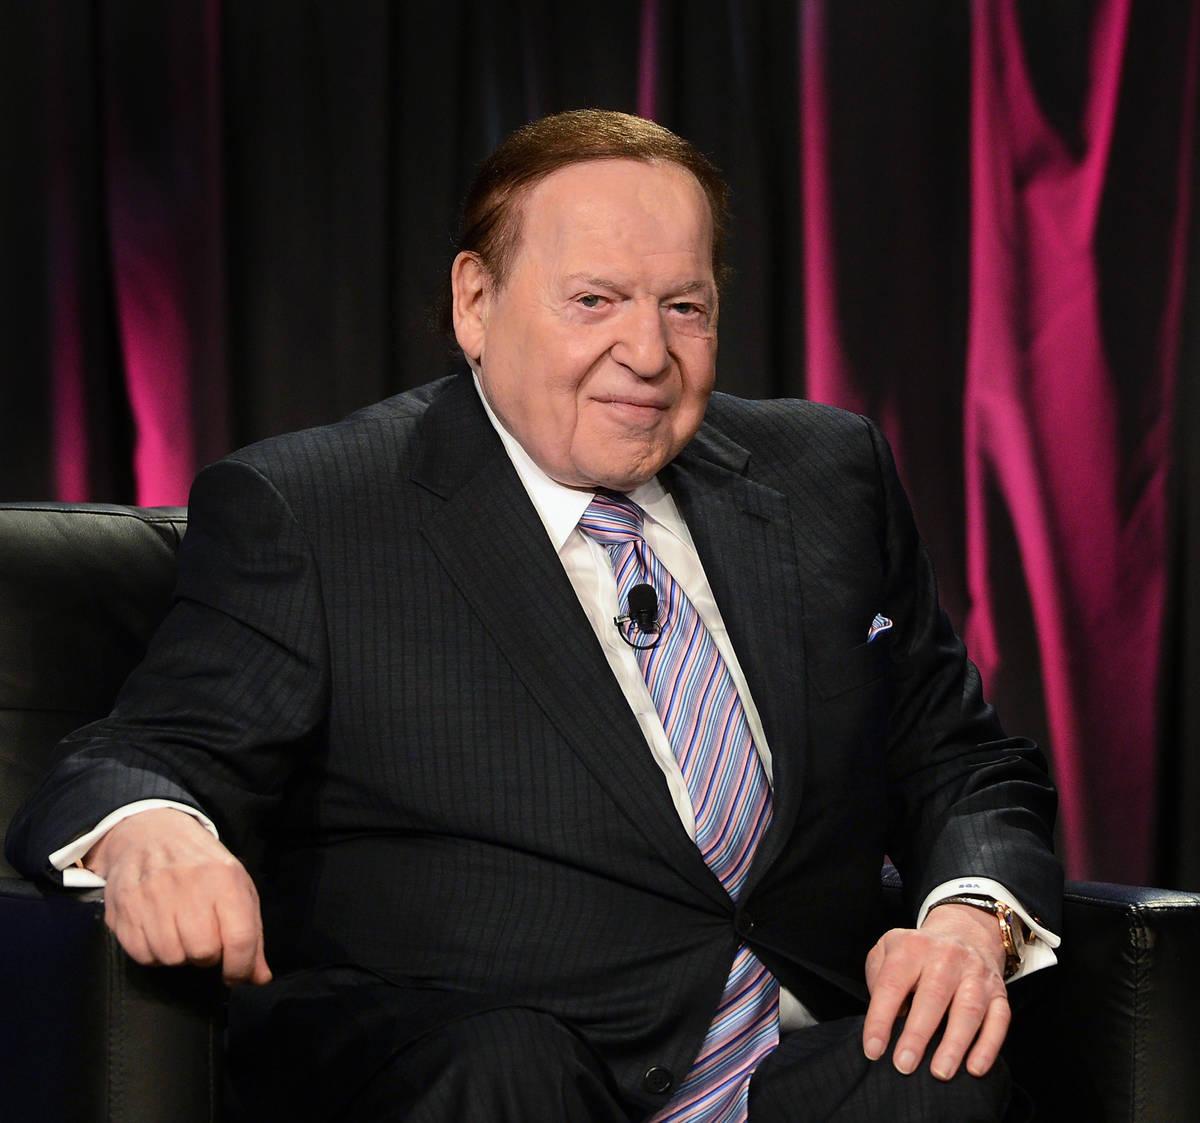 LAS VEGAS, NV - OCTOBER 01: Chairman & CEO Las Vegas Sands Corp., Sheldon Adelson speaks at th ...